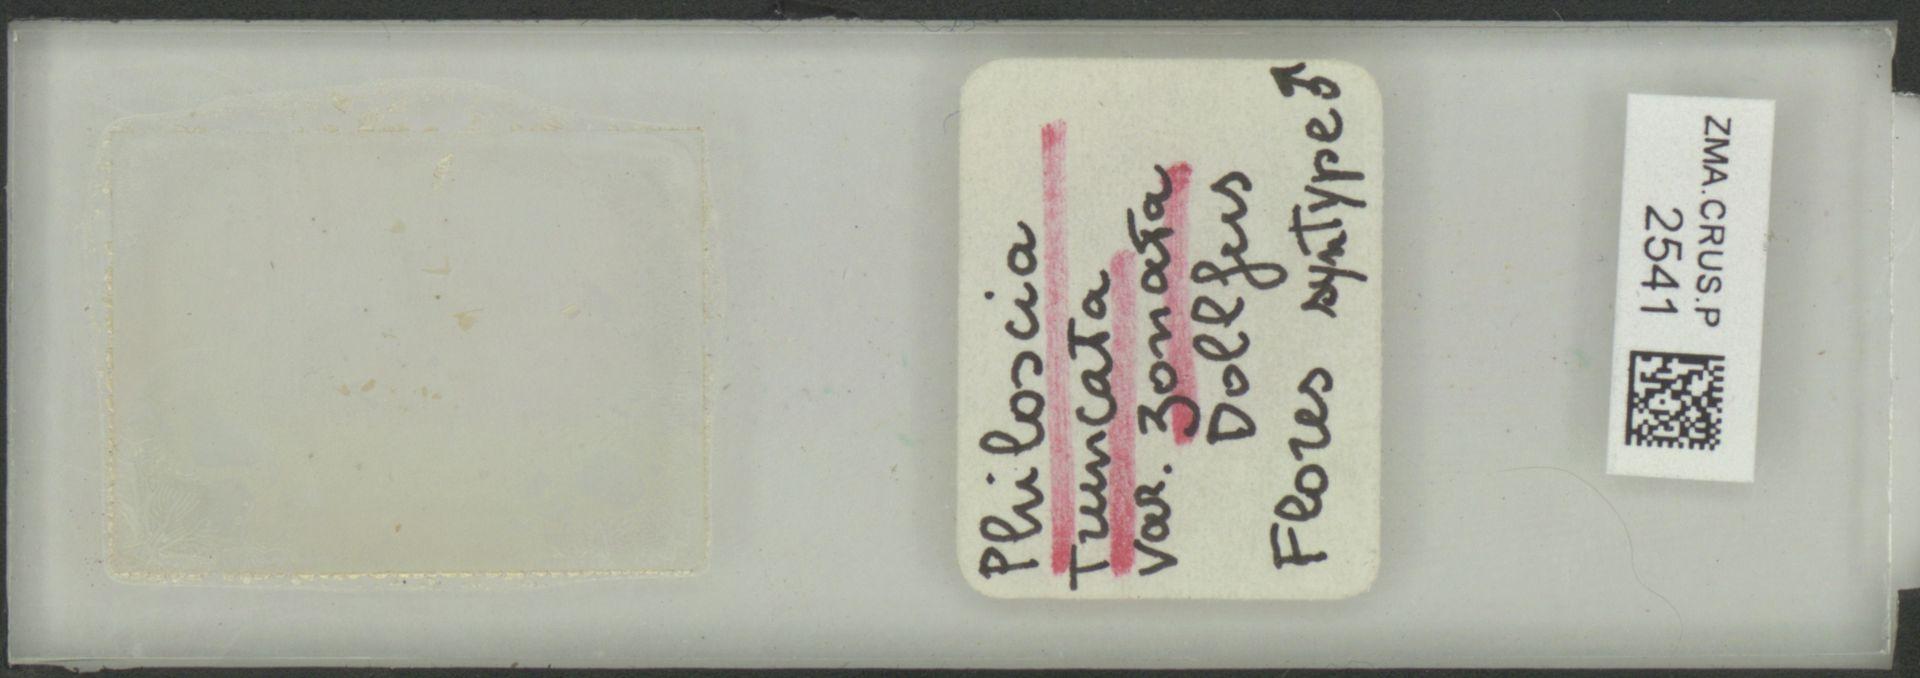 ZMA.CRUS.P.2541   Philoscia truncata zonata Dollfus